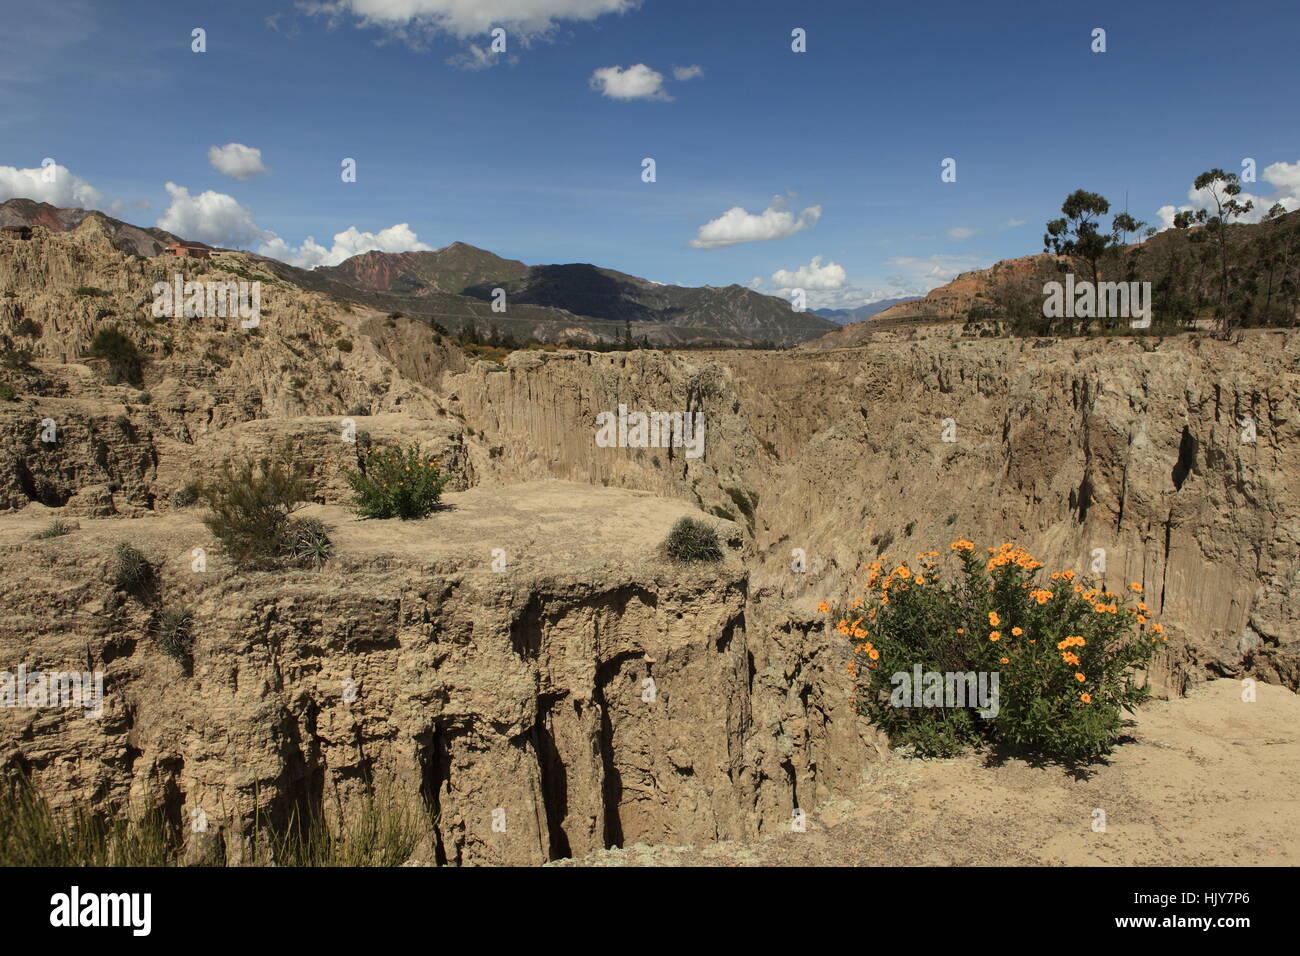 valley of the moon valle de la luna bolivia Stock Photo